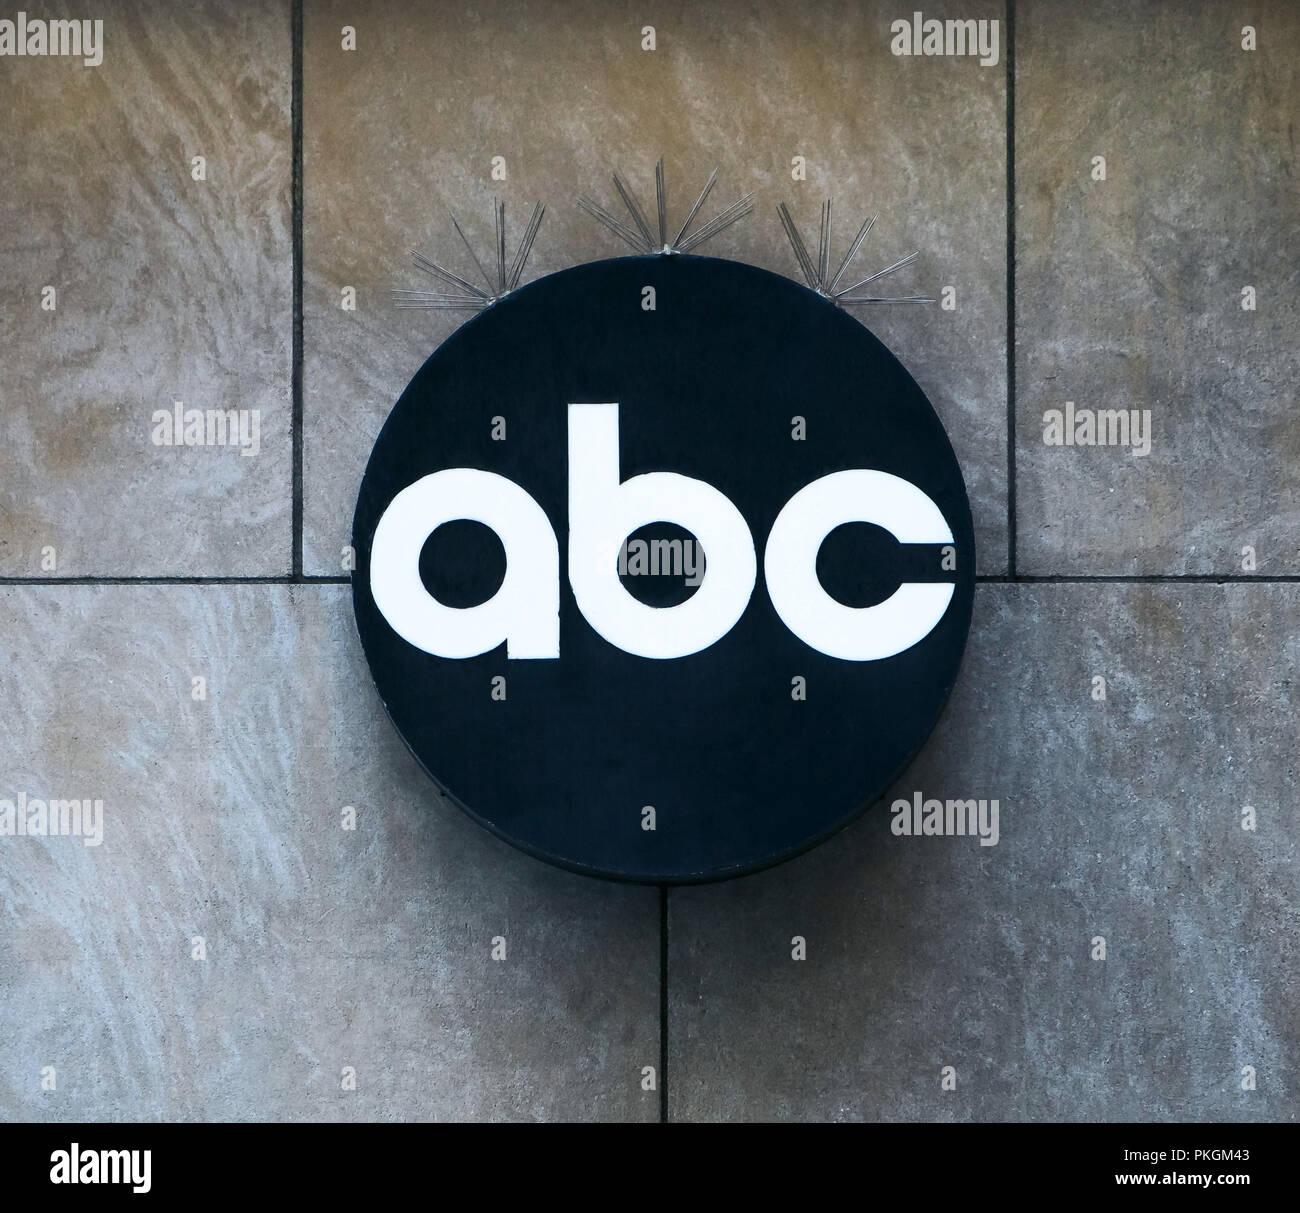 Abc Tv Logo Stock Photos & Abc Tv Logo Stock Images - Alamy